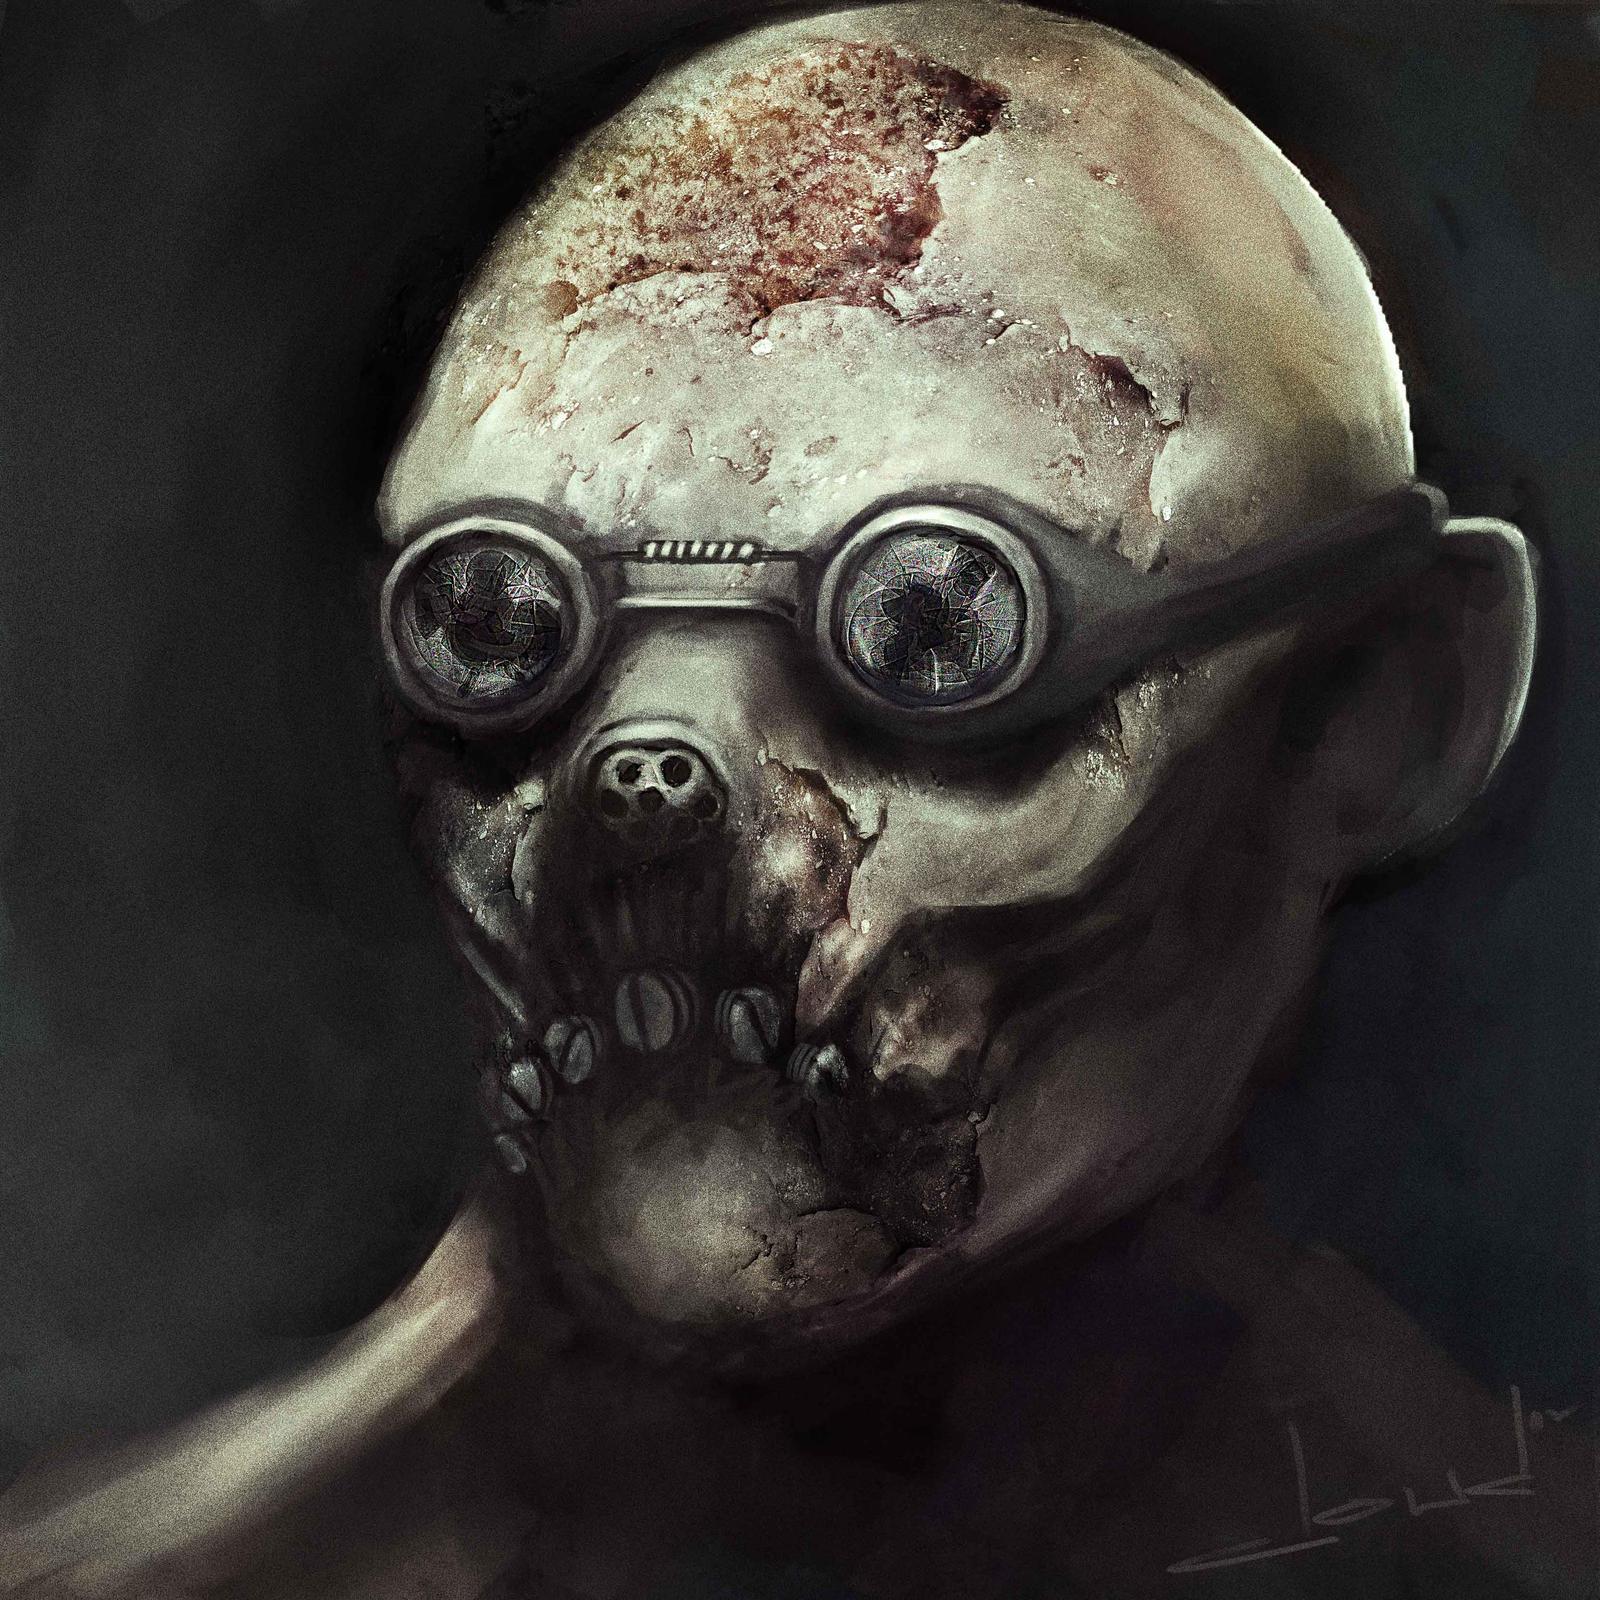 Dumpface SP by Darkcloud013